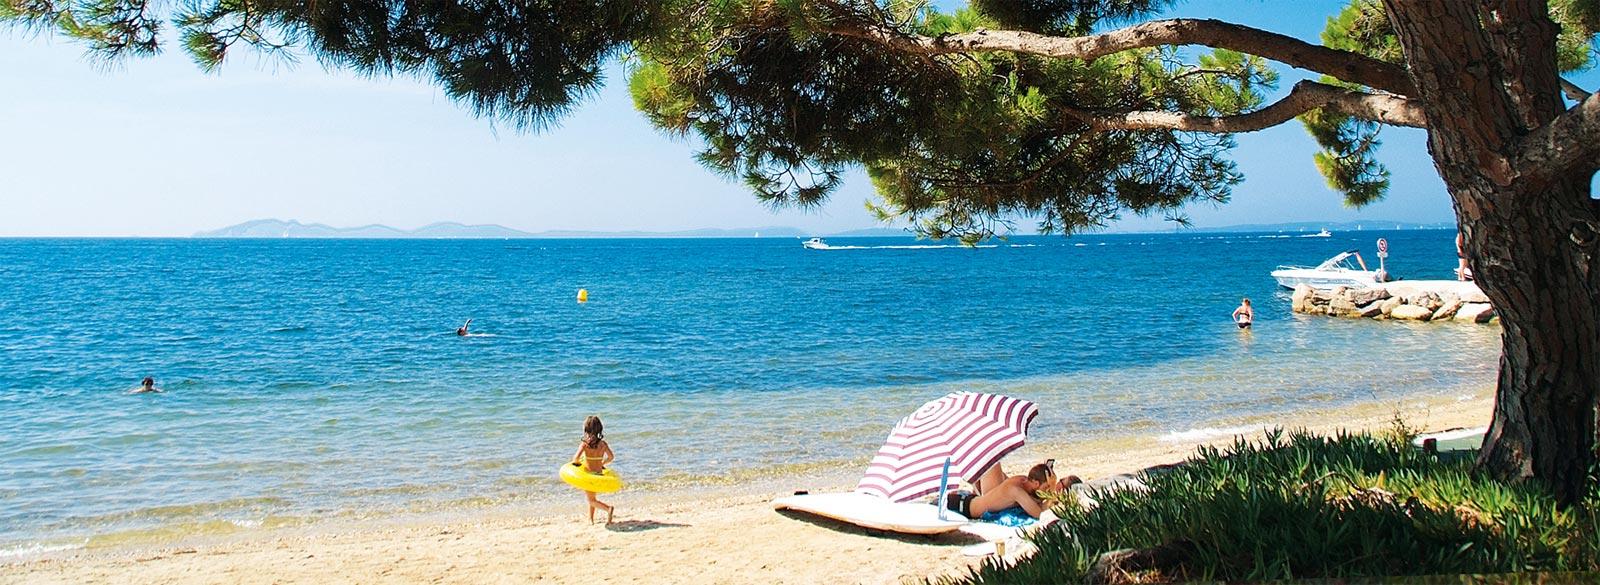 kamperen op het strand massif des maures